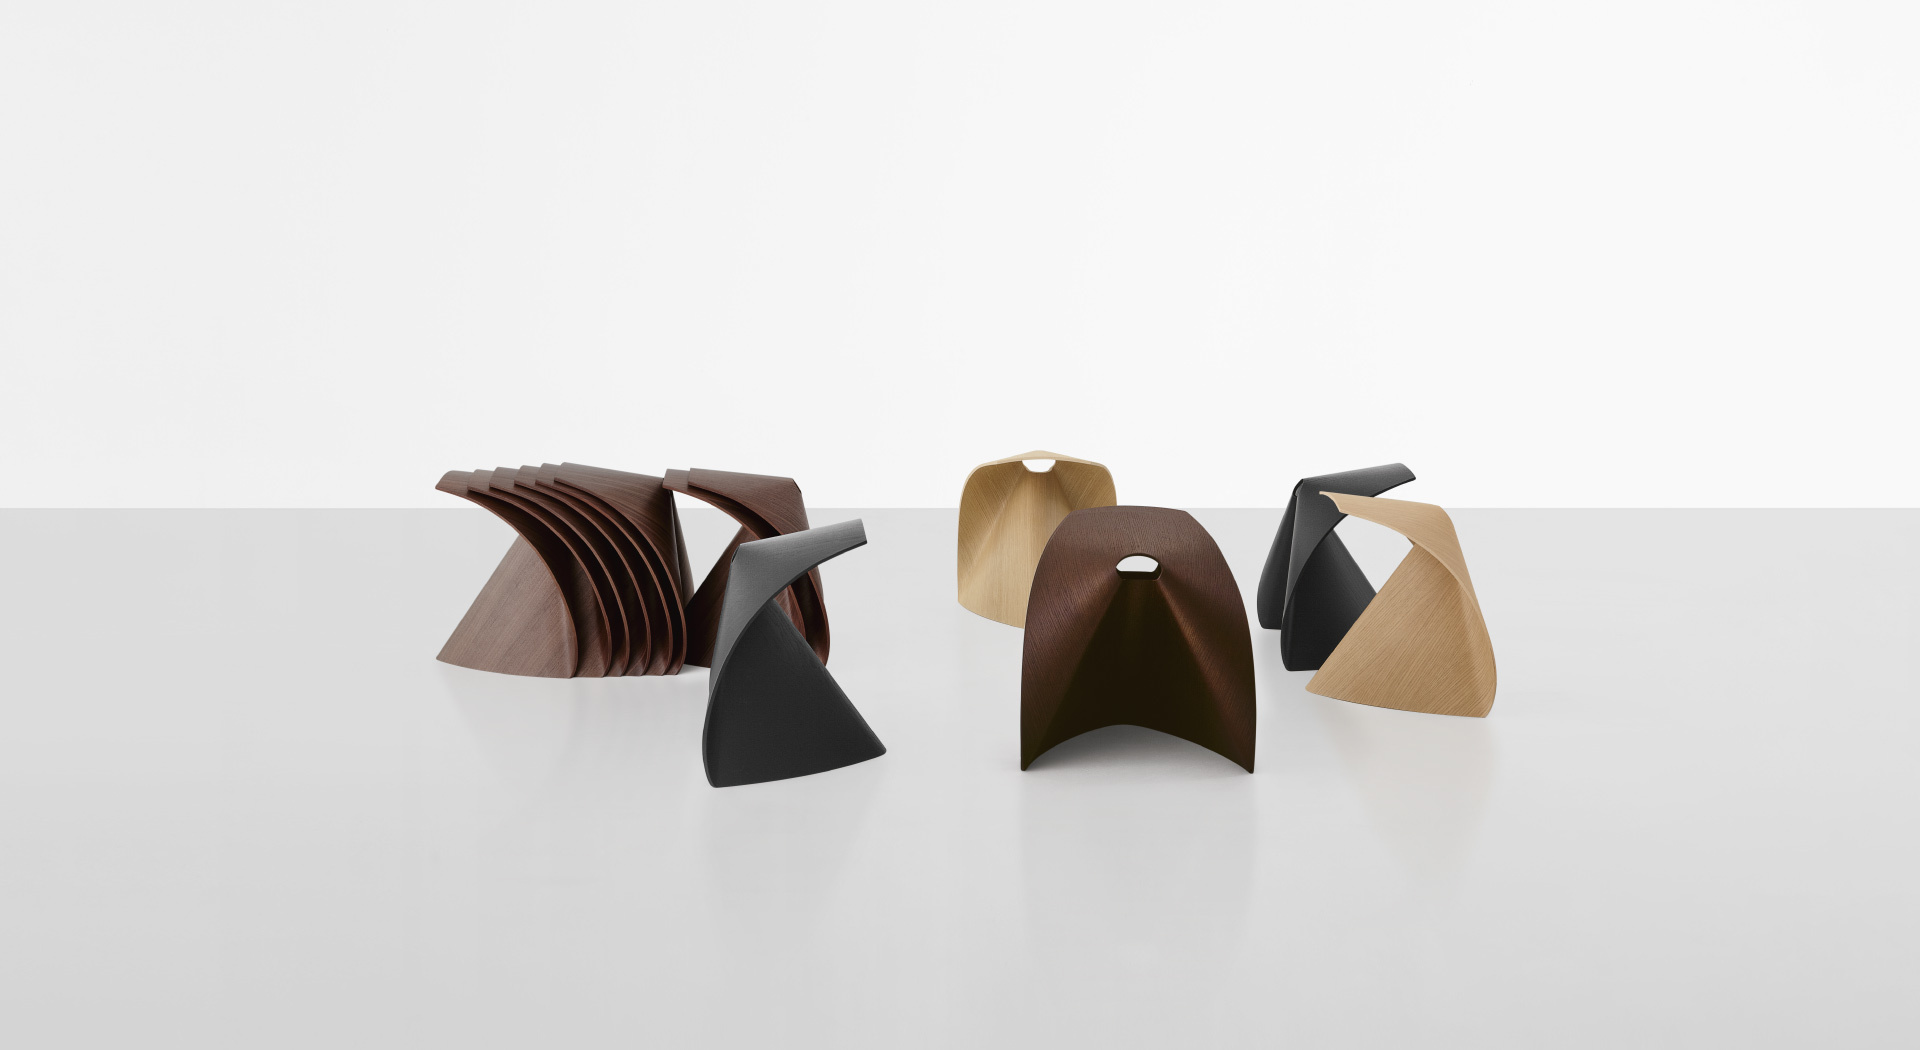 Sgabelli Bassi Design.Ap Sgabelli Bassi Di Design In Legno Lapalma